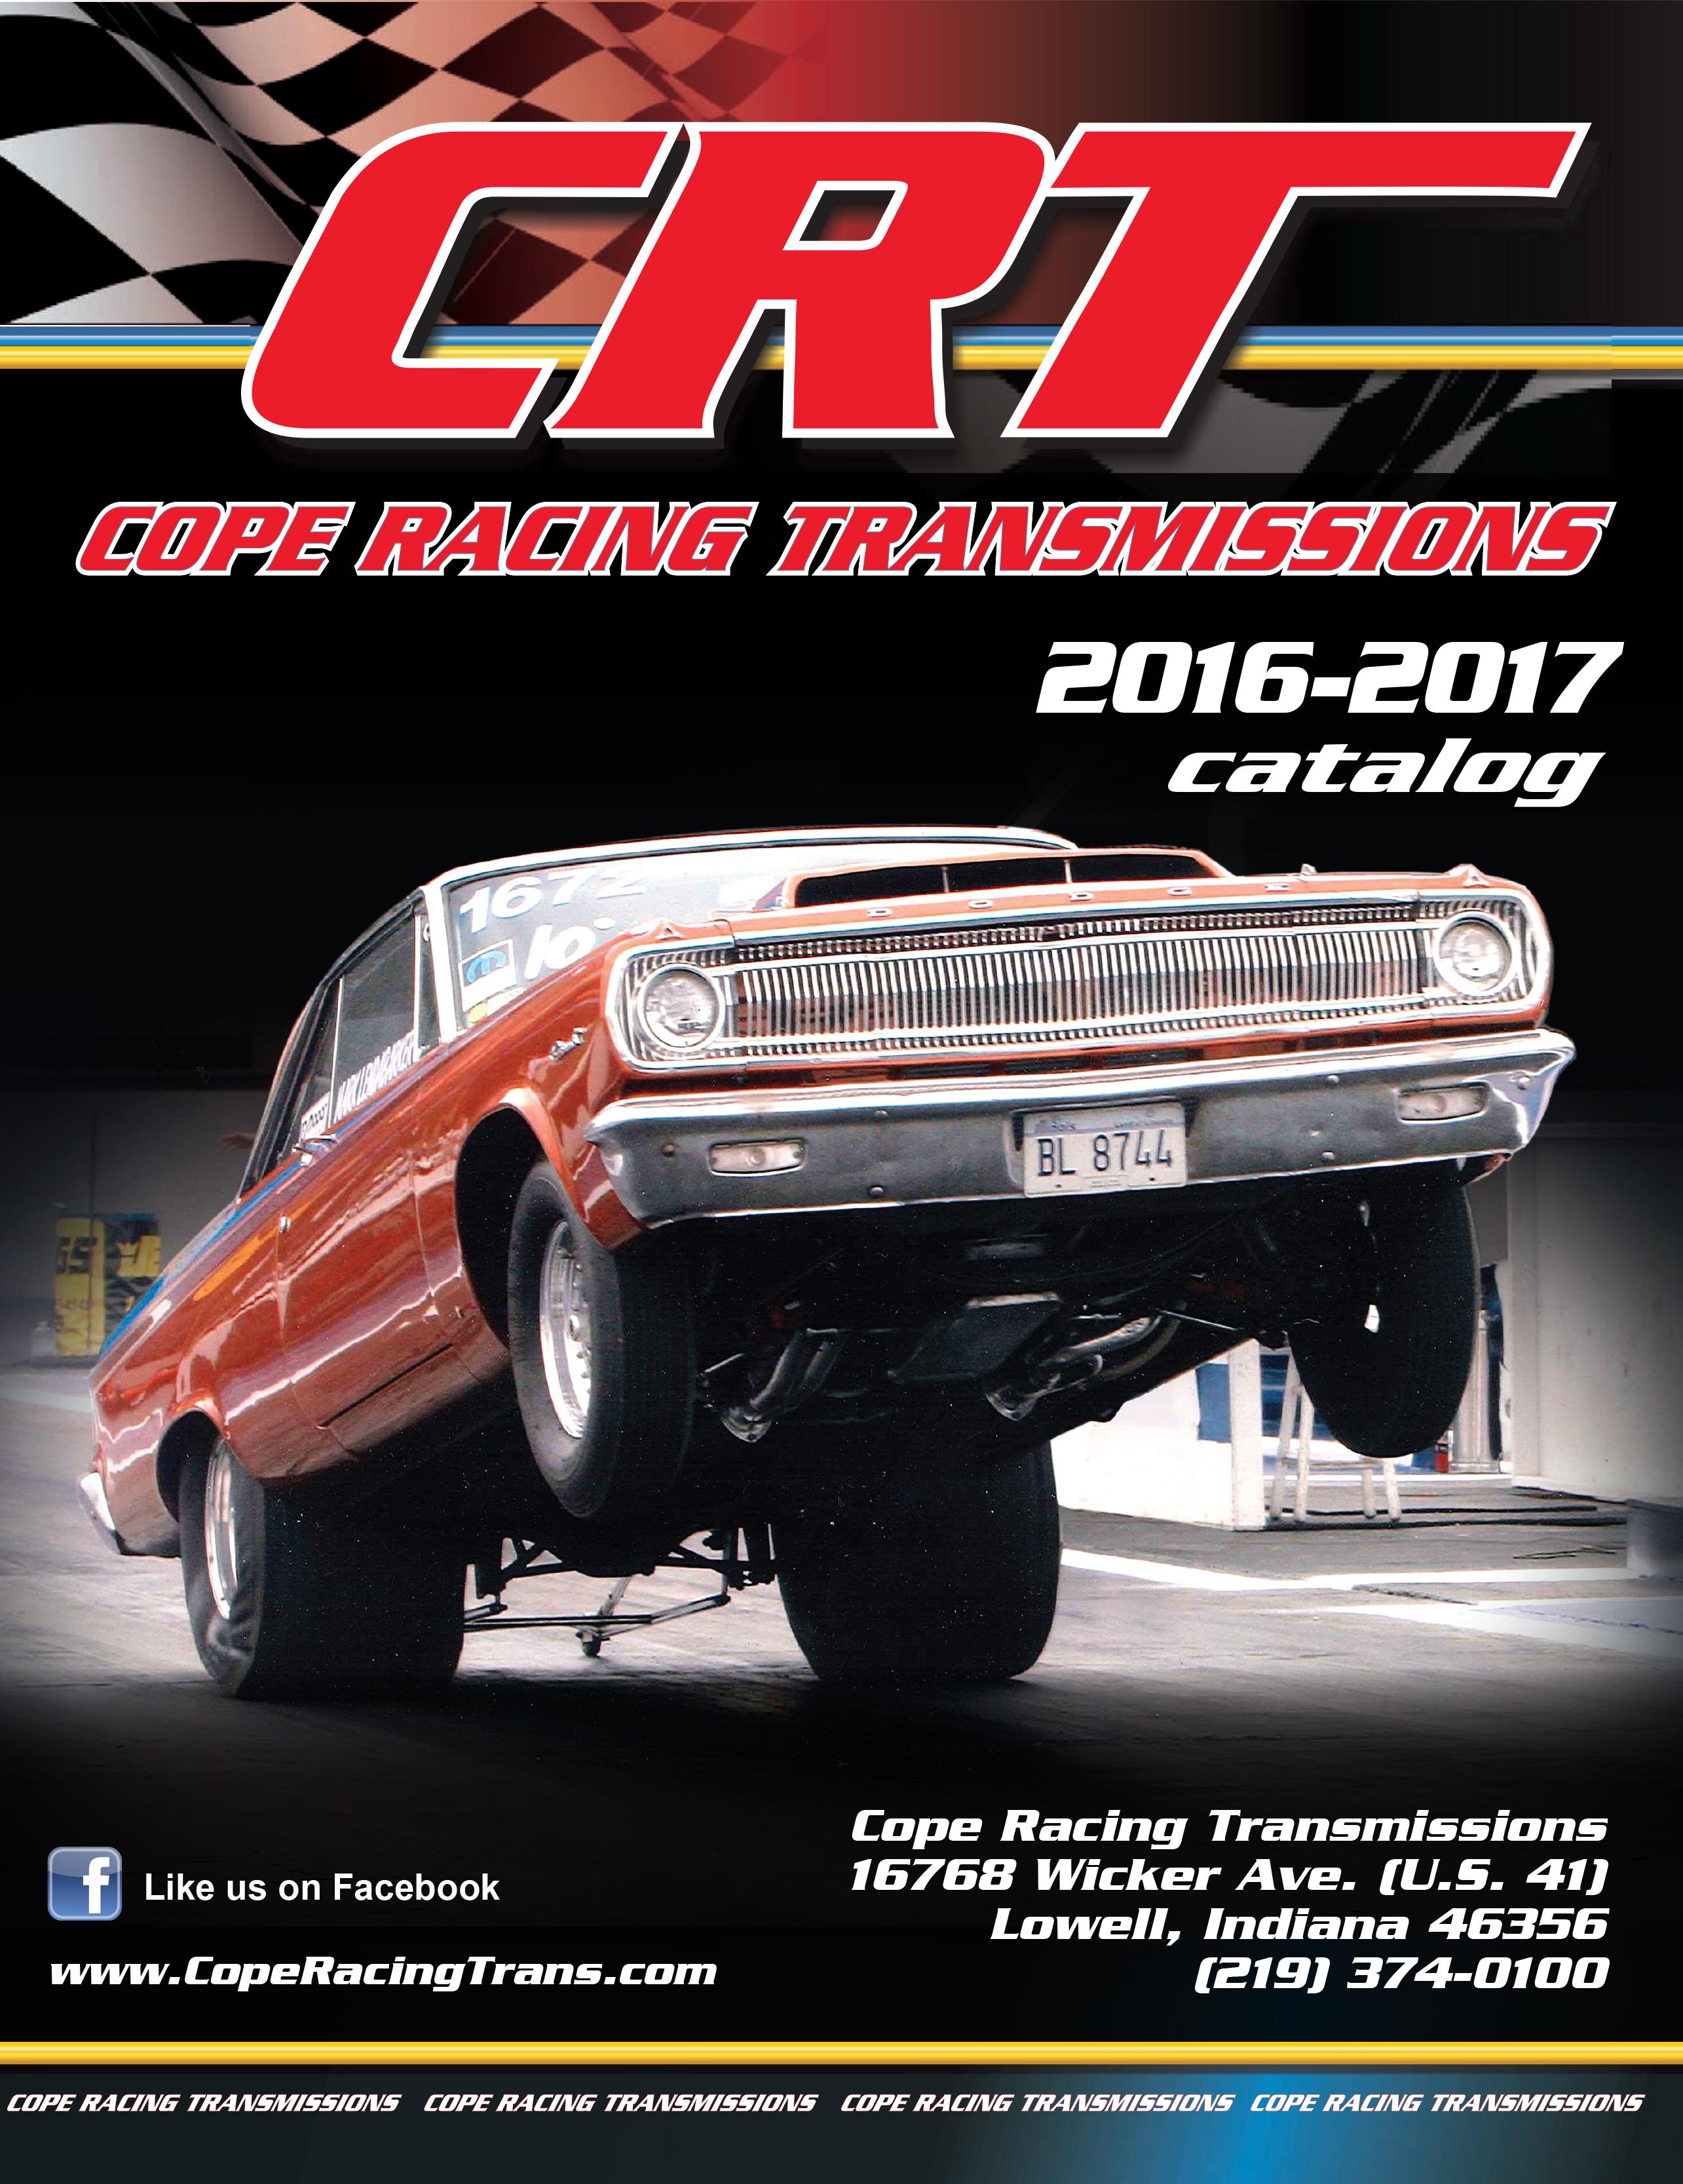 Cope Racing